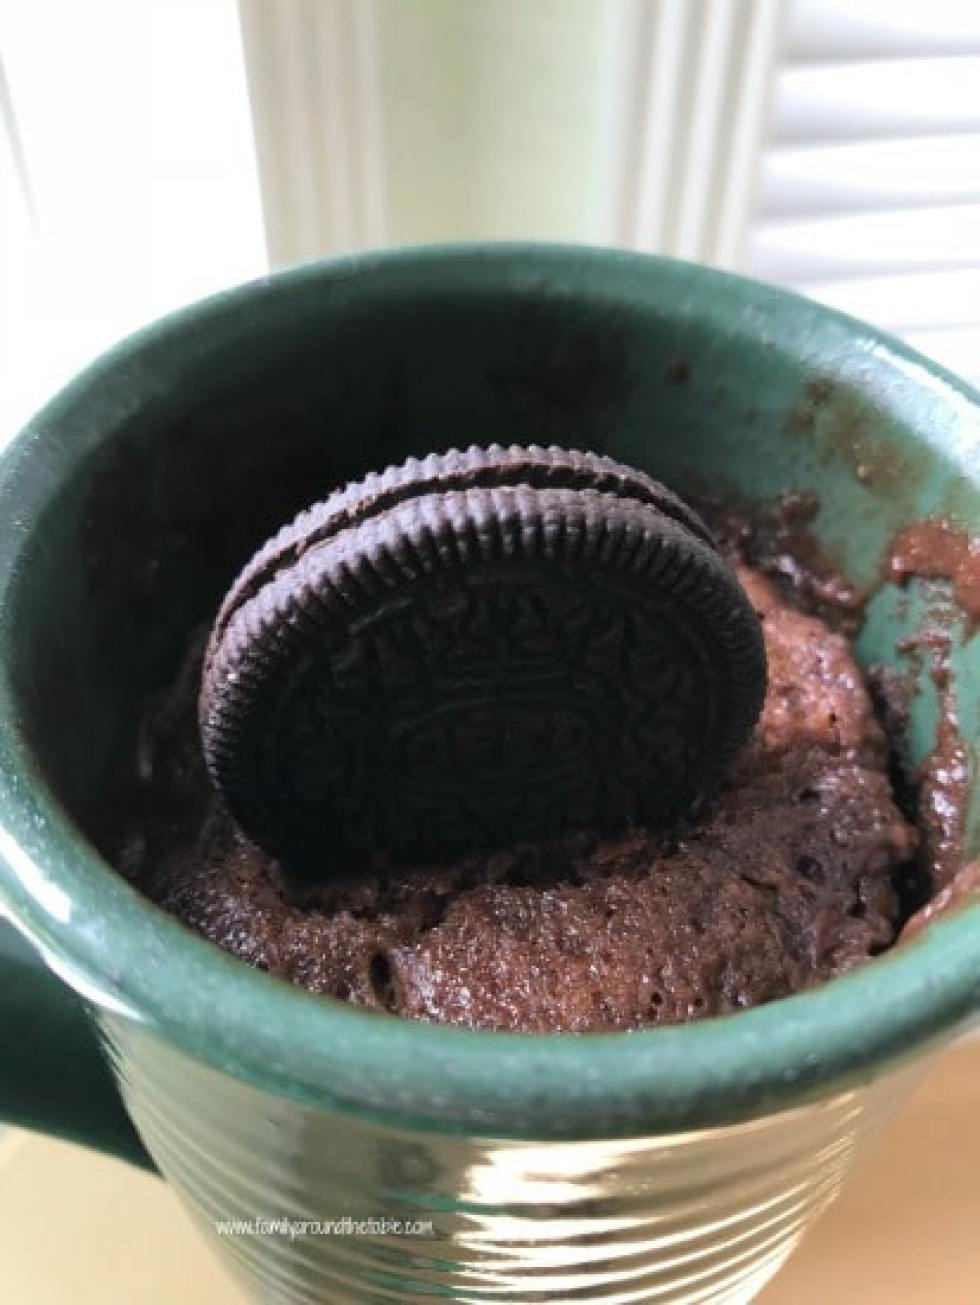 Chocolate mug cake in a green mug with Oreo on top.